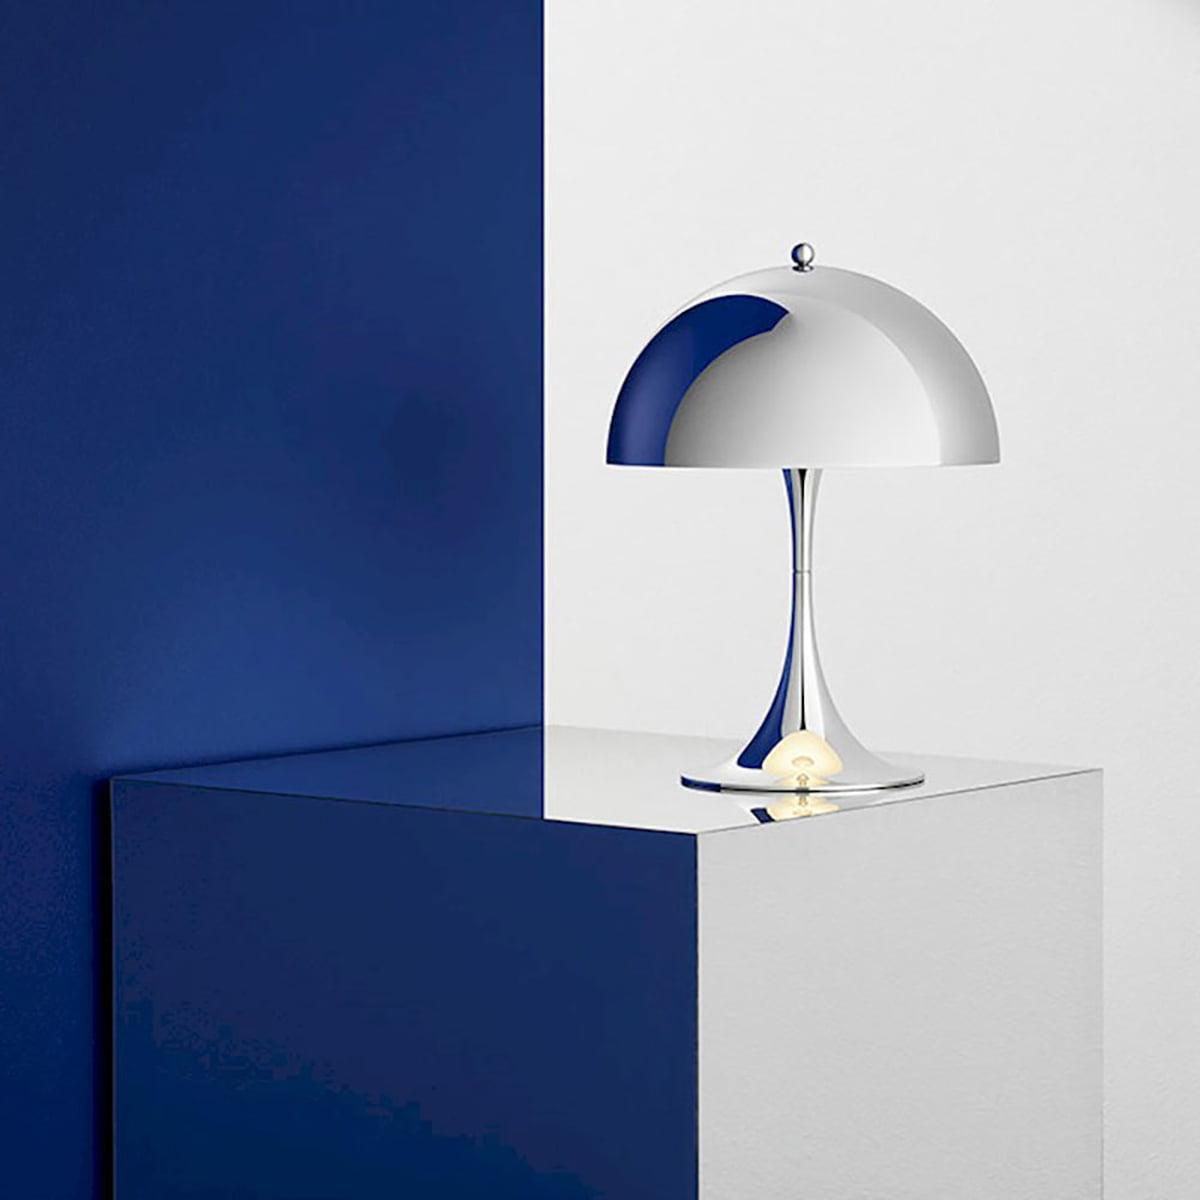 panthella mini tischleuchte von louis poulsen connox. Black Bedroom Furniture Sets. Home Design Ideas